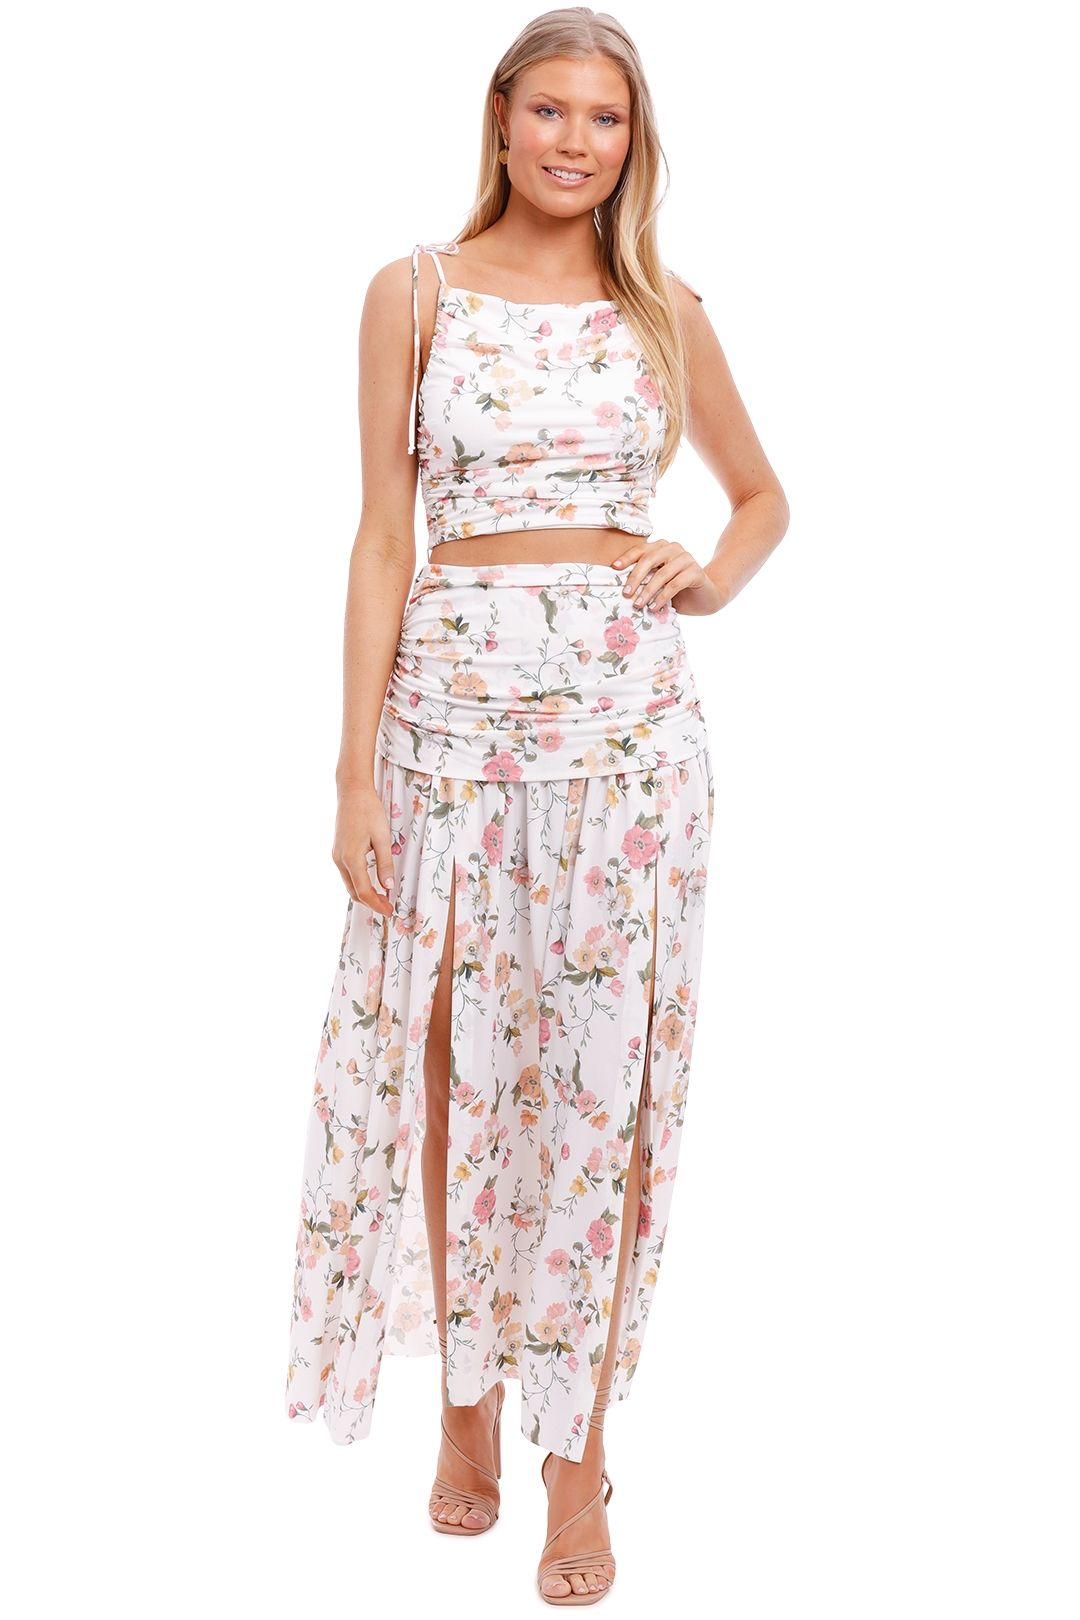 Bec and Bridge Isla Print Top and Skirt Set